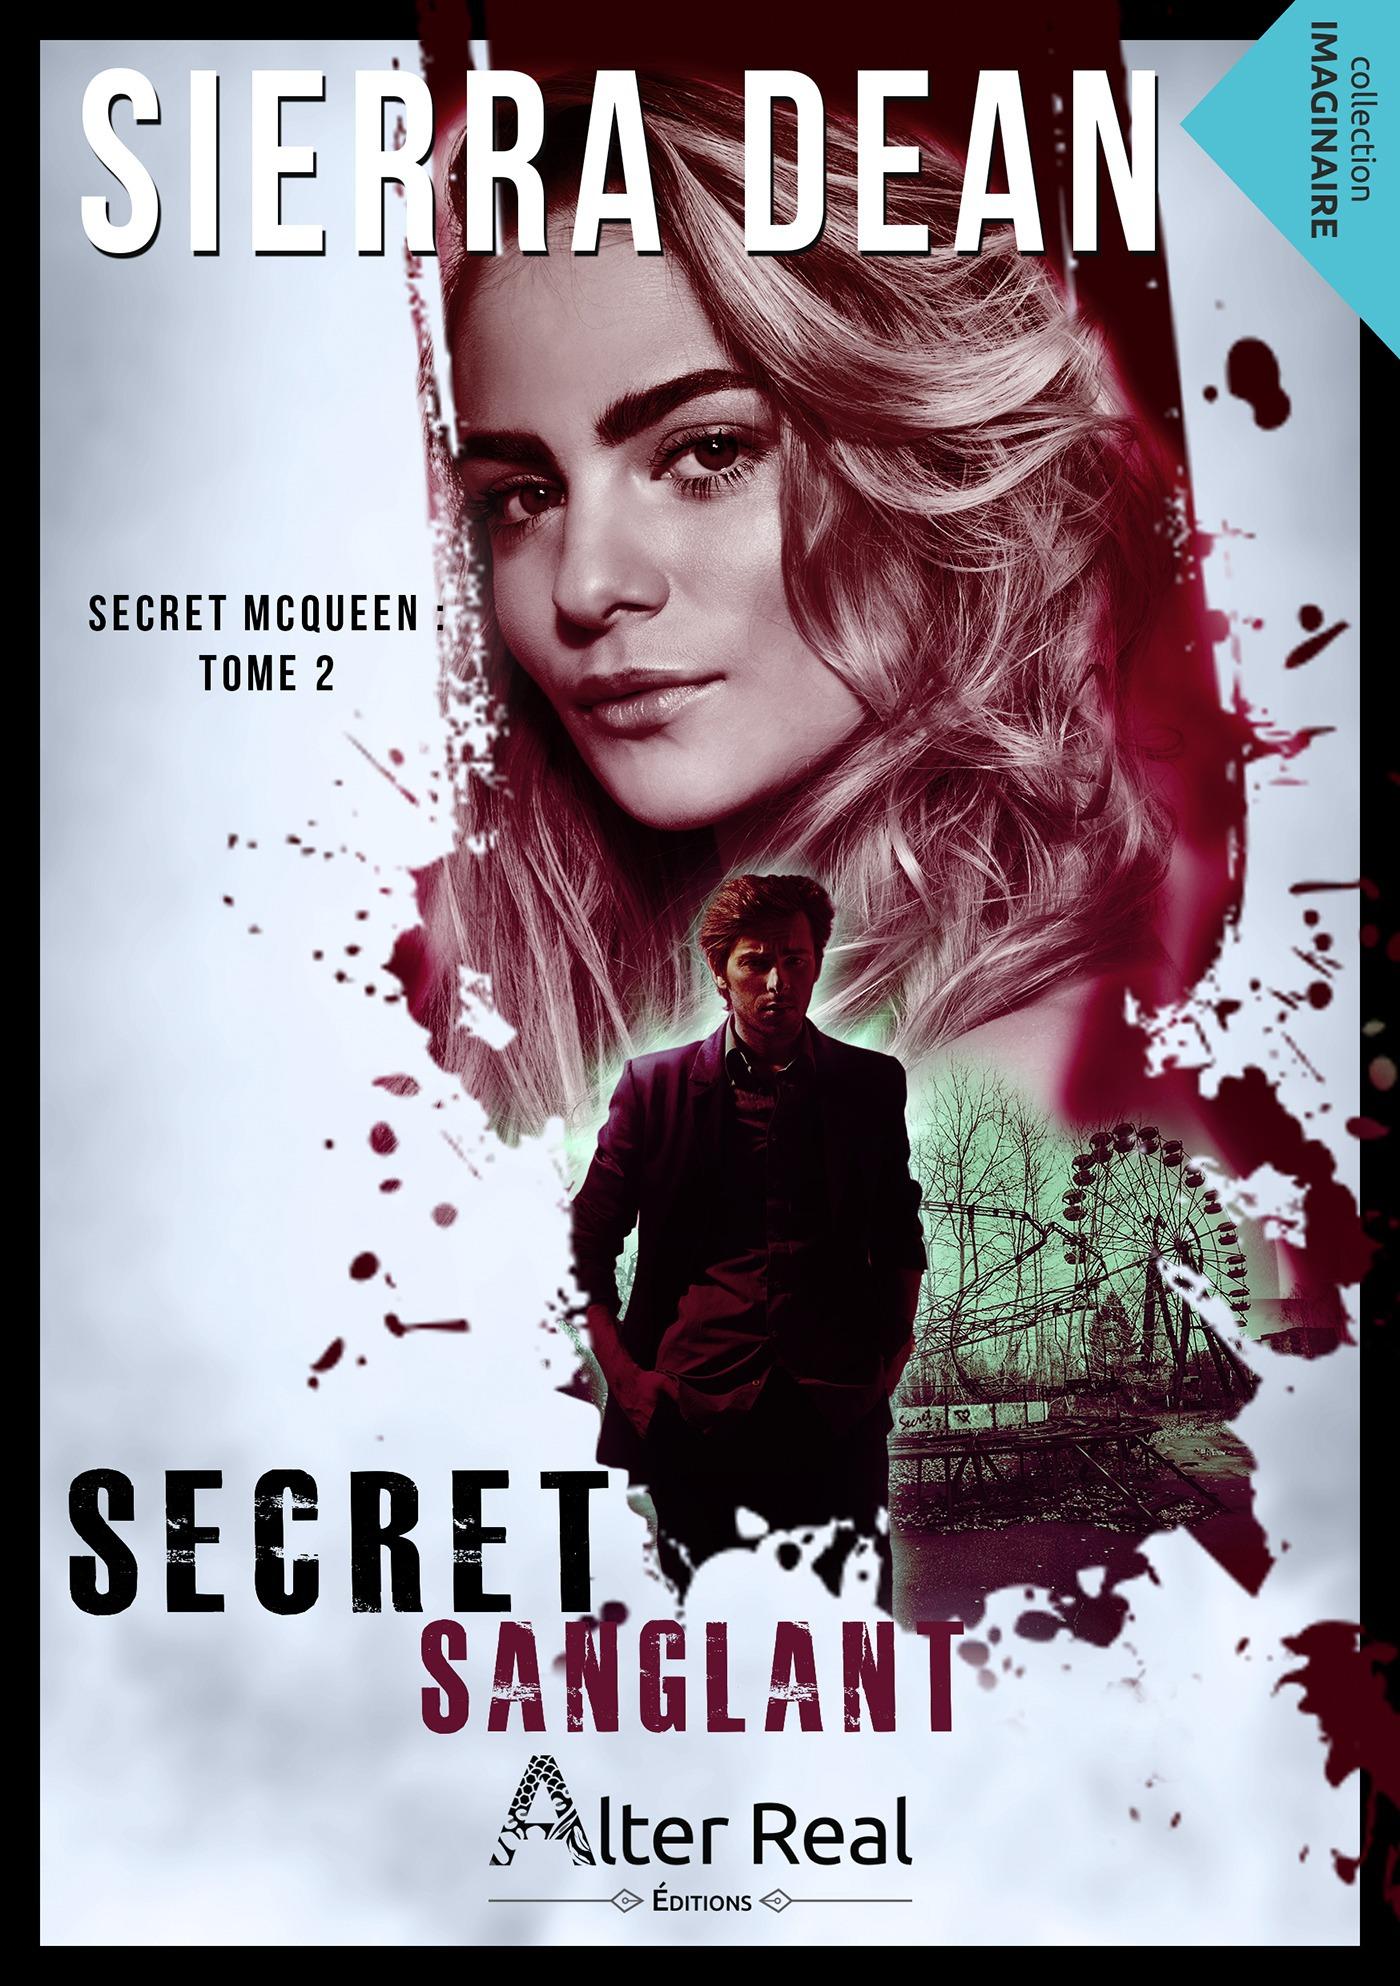 Secret sanglant